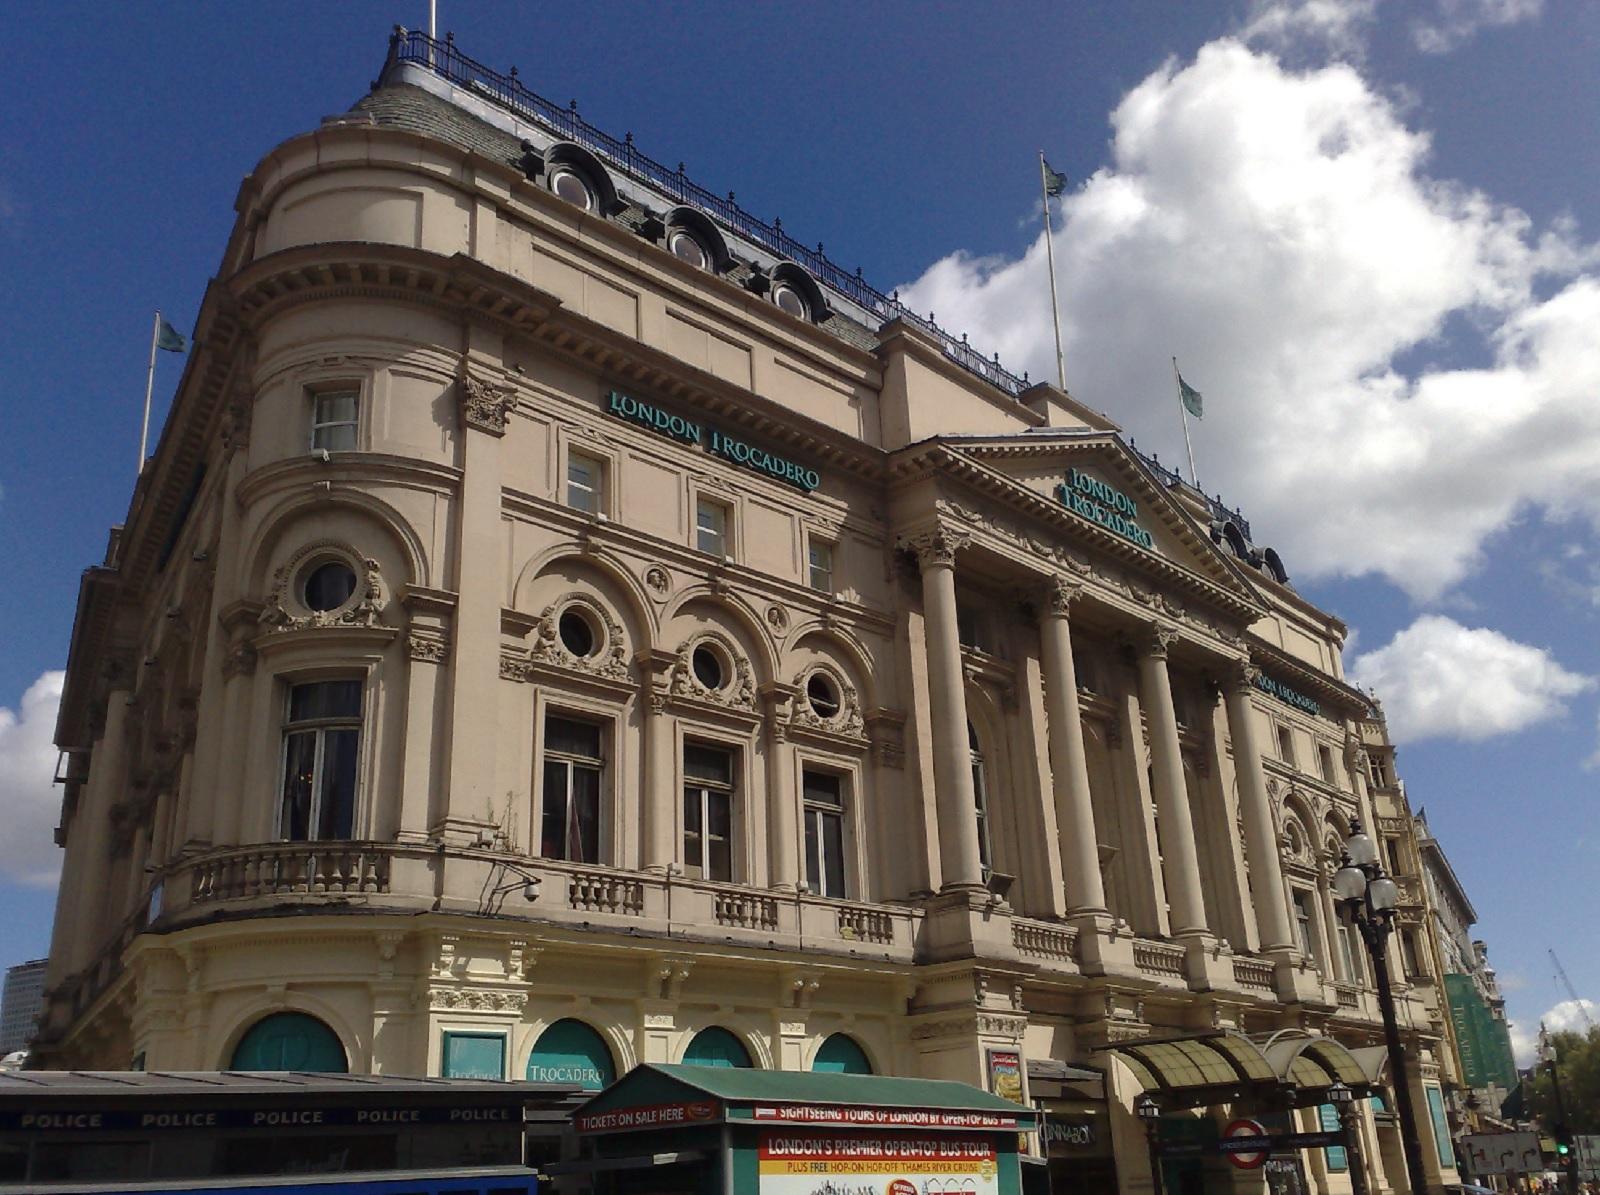 London Trocadero Case Studies gallery image 1